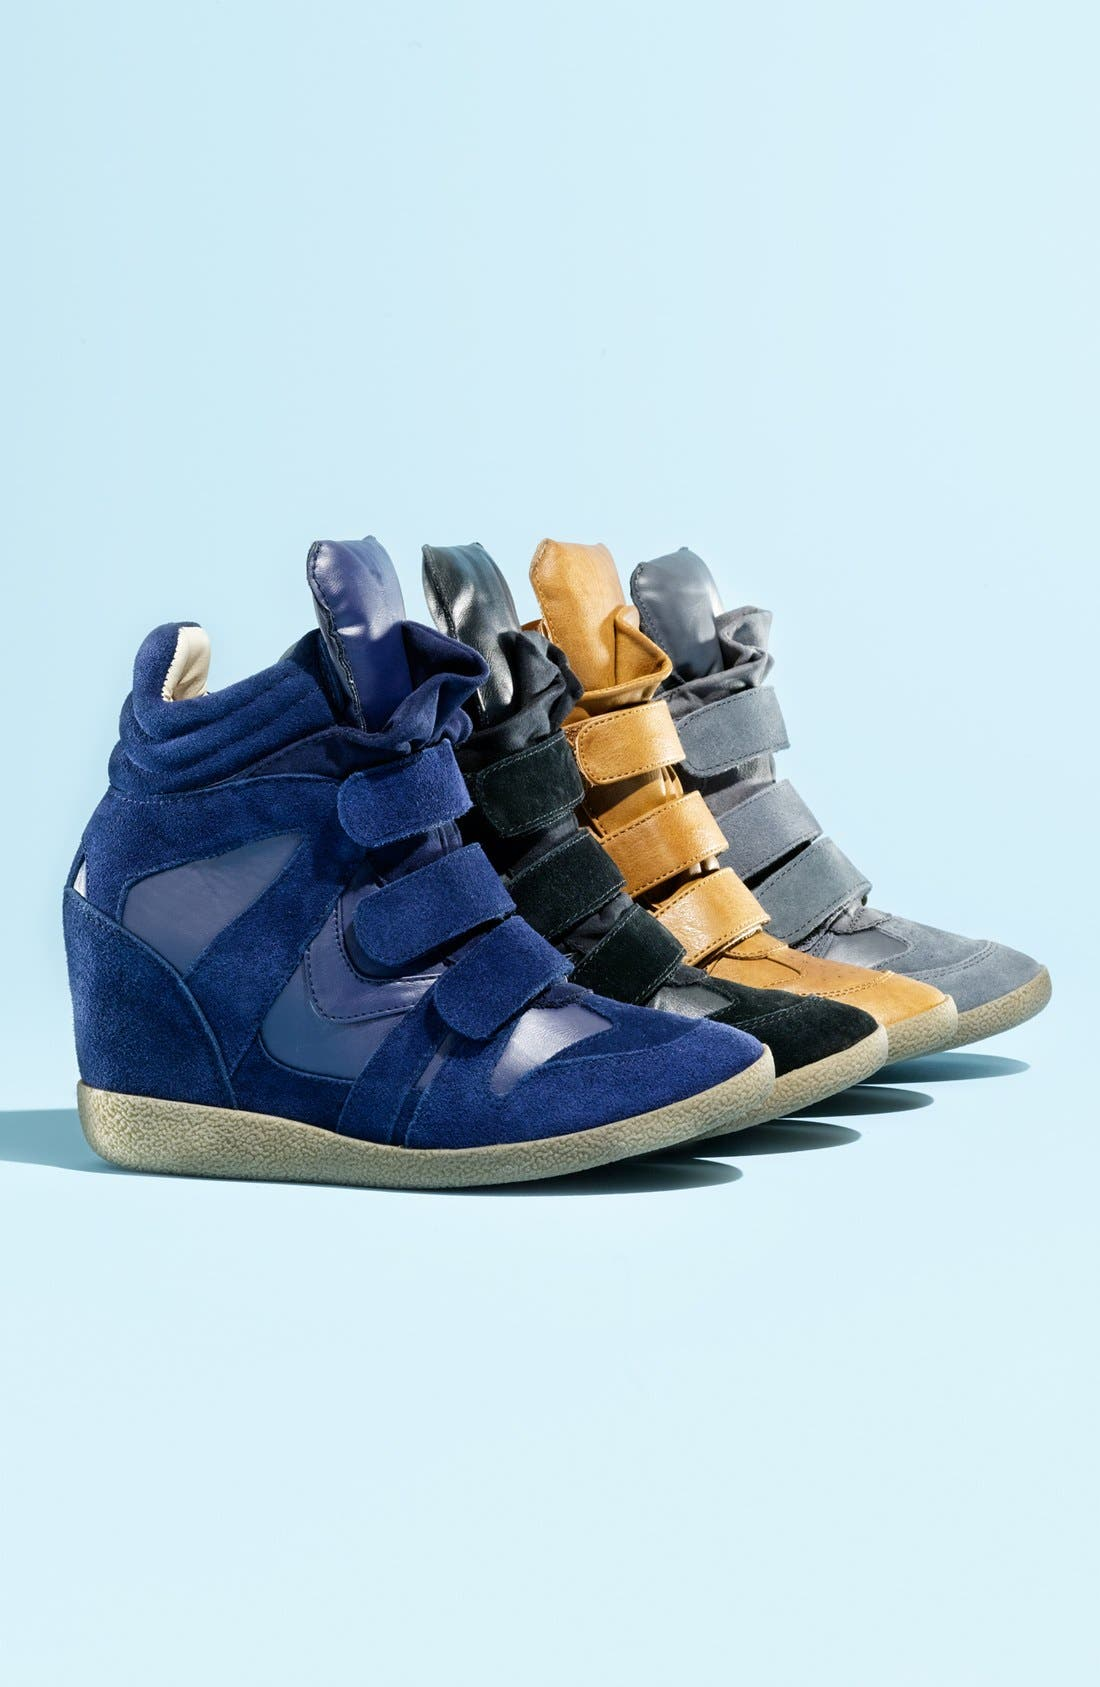 'Hilight' Wedge Sneaker,                             Main thumbnail 1, color,                             300